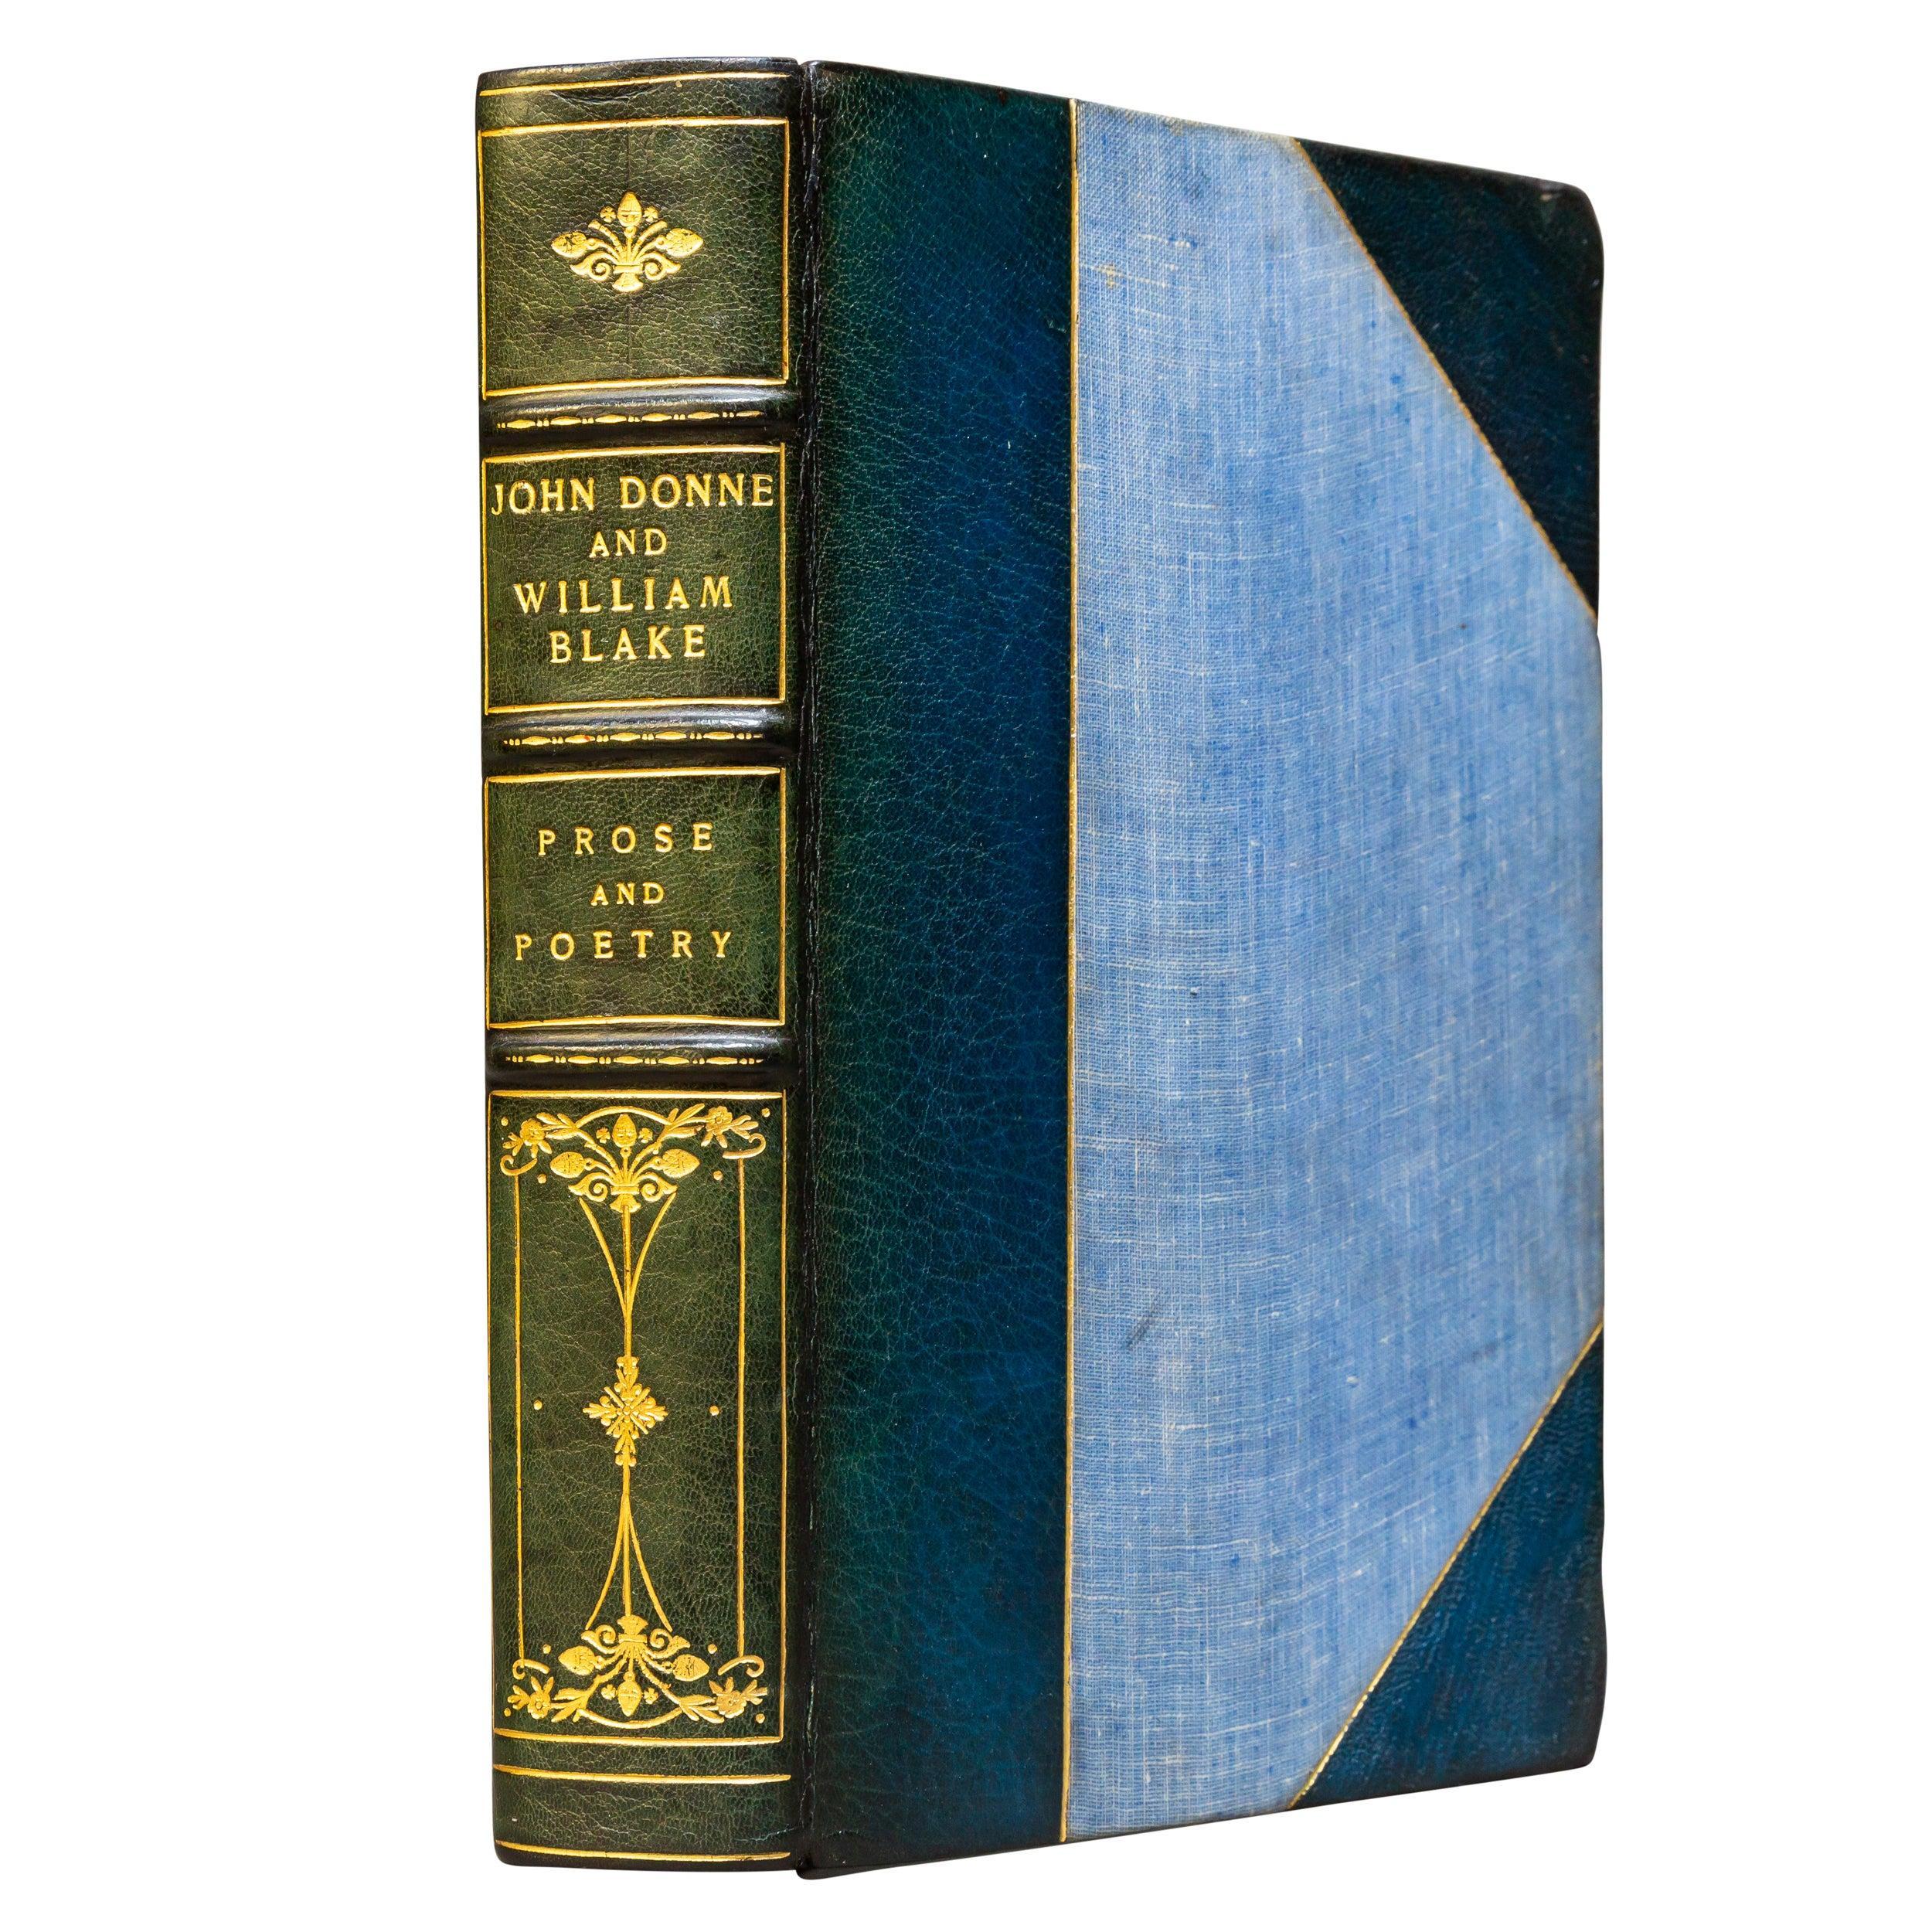 'Books' 1 Volume, John Donne & William Blake, The Complete Poetry